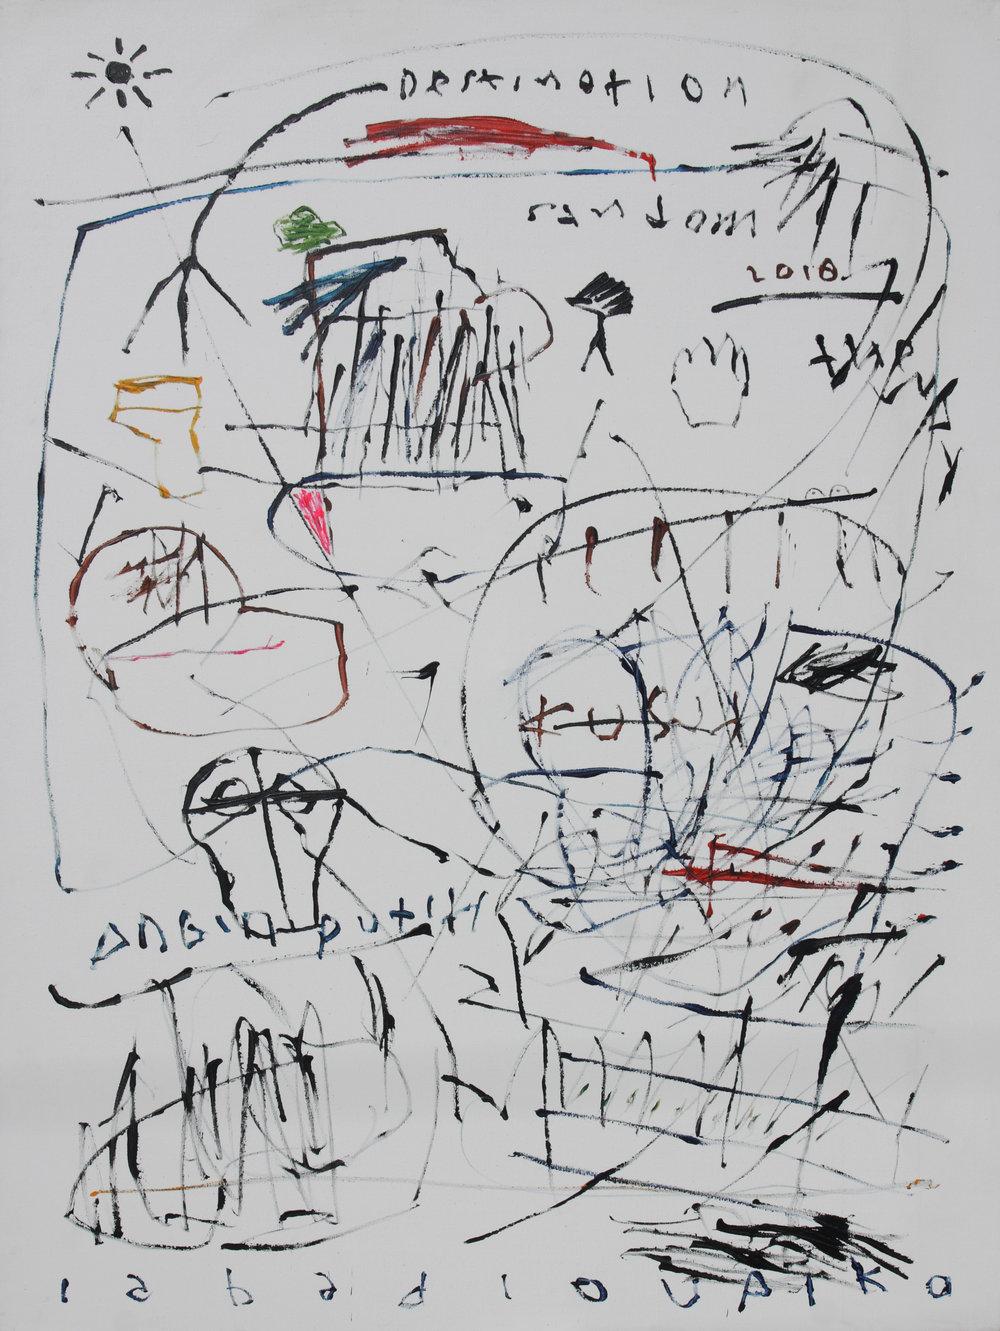 Artist: Iabadiou Piko, (INDONESIA)  Title: Random Destination Medium: acrylic on linen blend Dimension: 200 cm x 150 cm Year: 2018